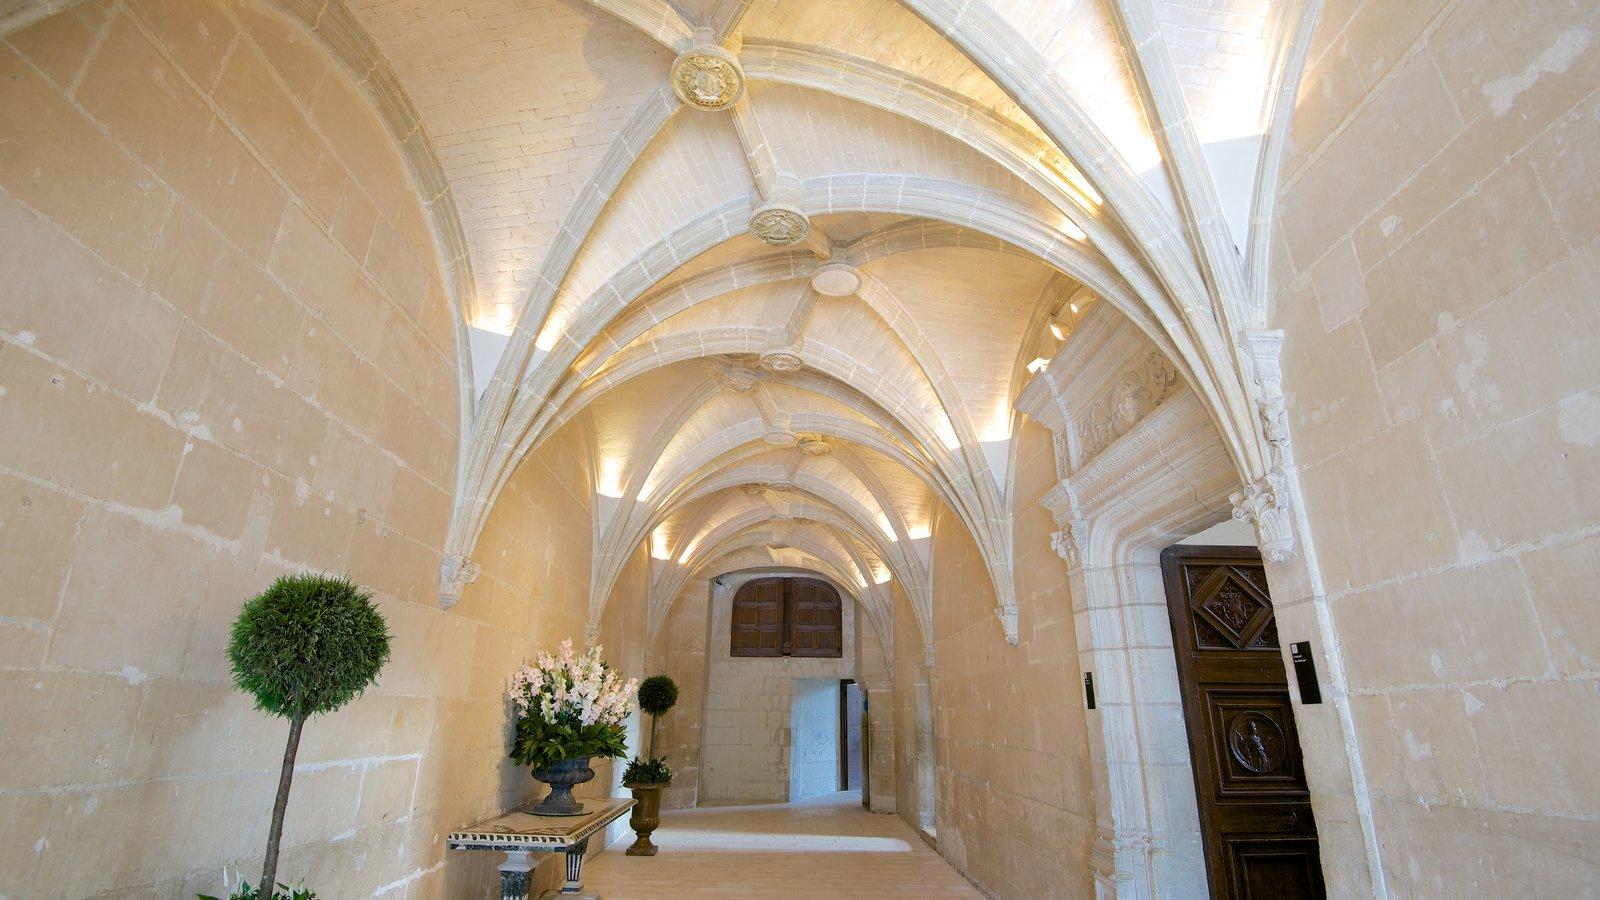 Historical Pictures: View Images of Chateau de Chenonceau